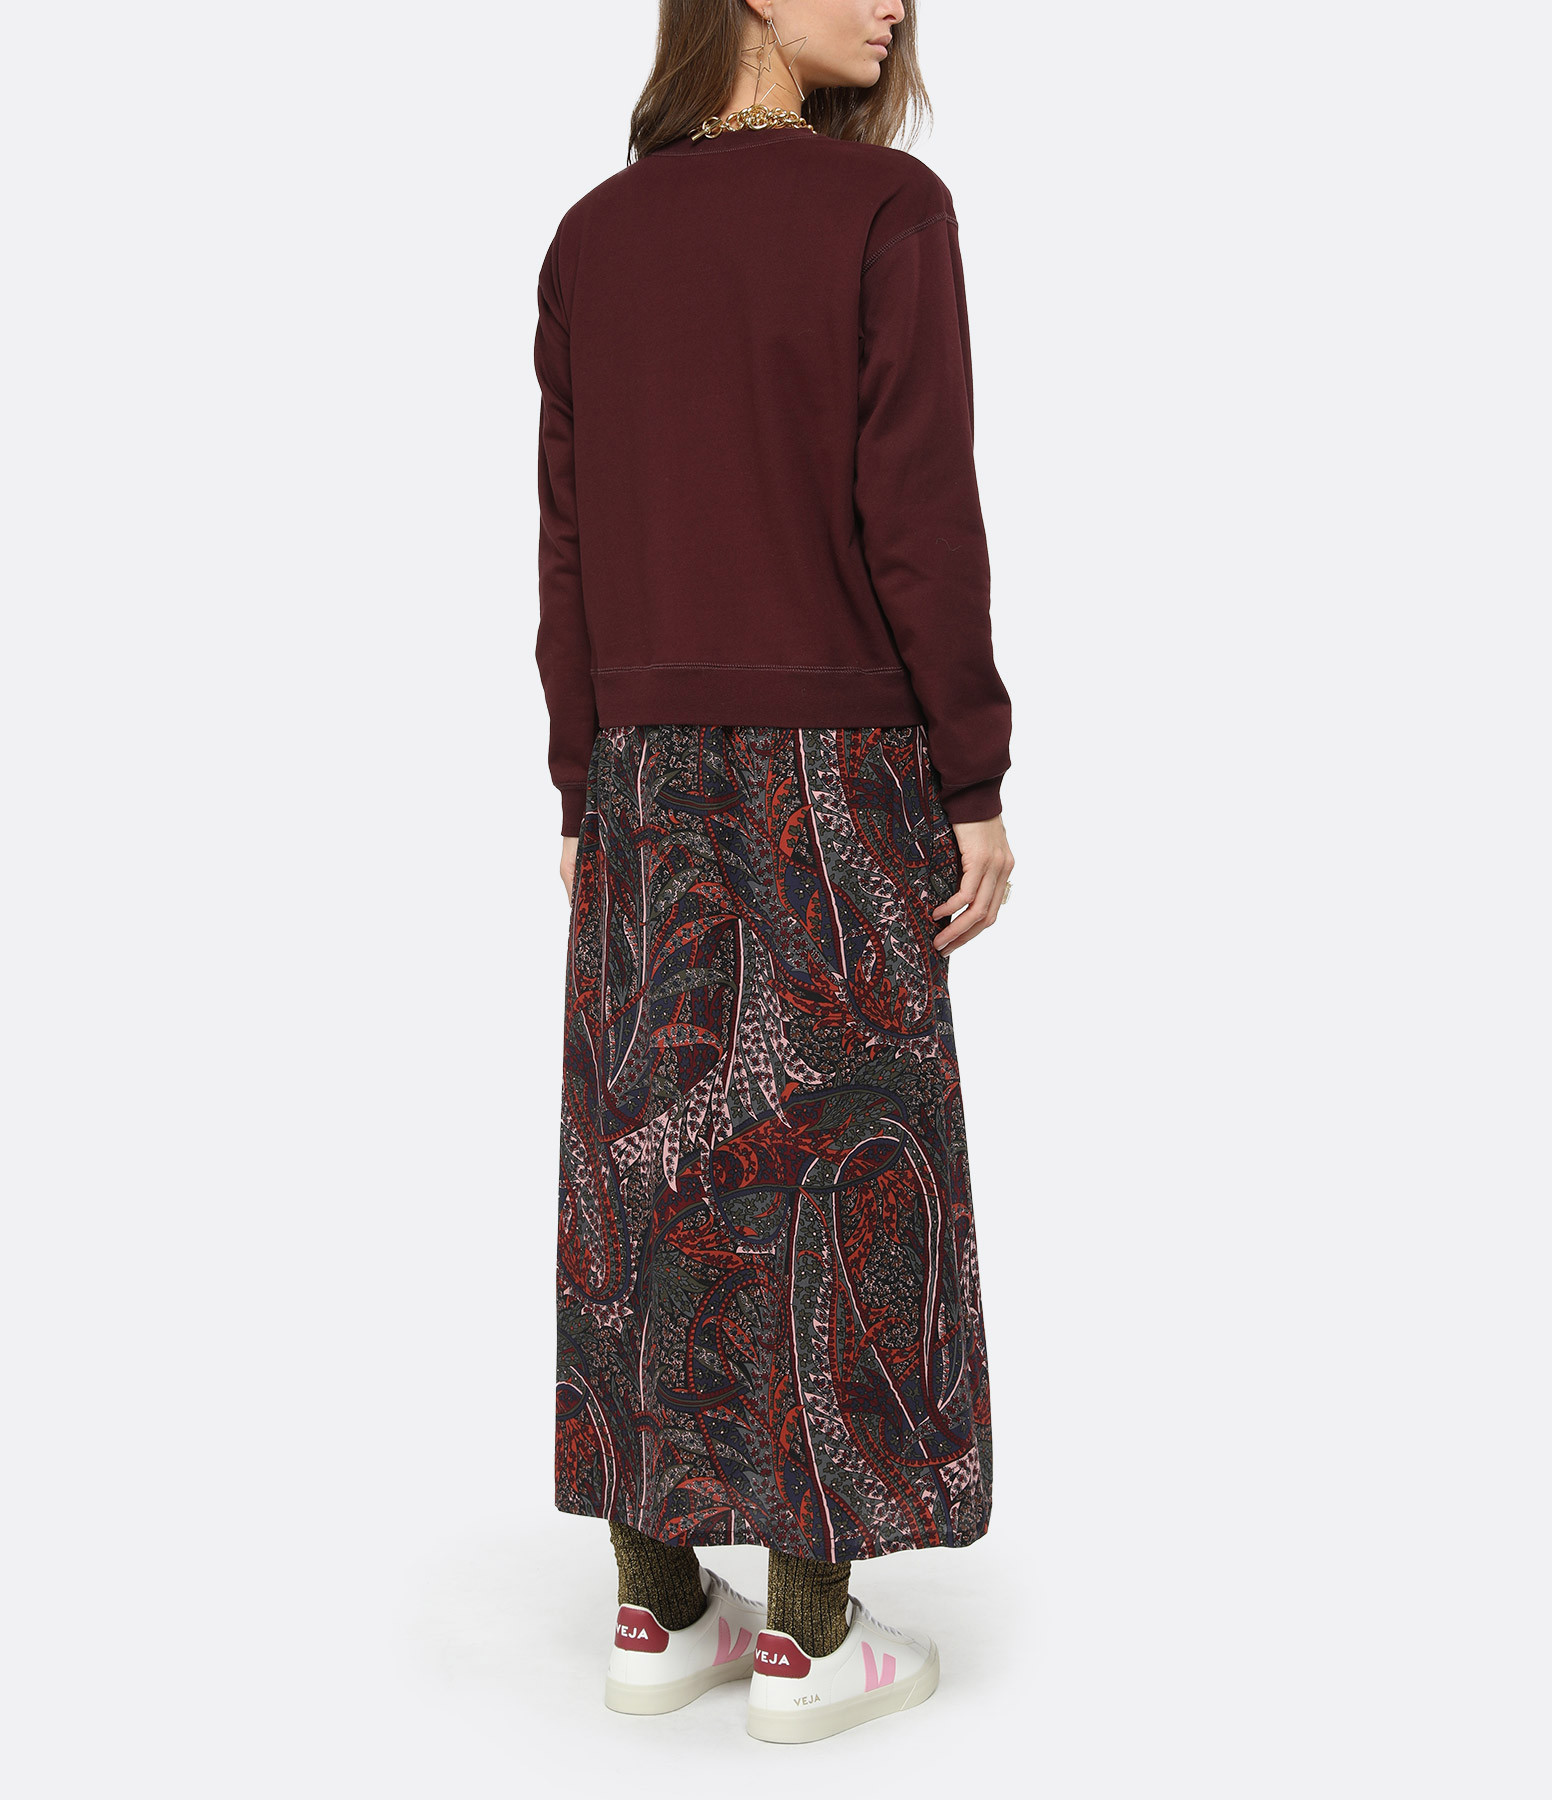 VANESSA BRUNO - Robe Peg Bordeaux